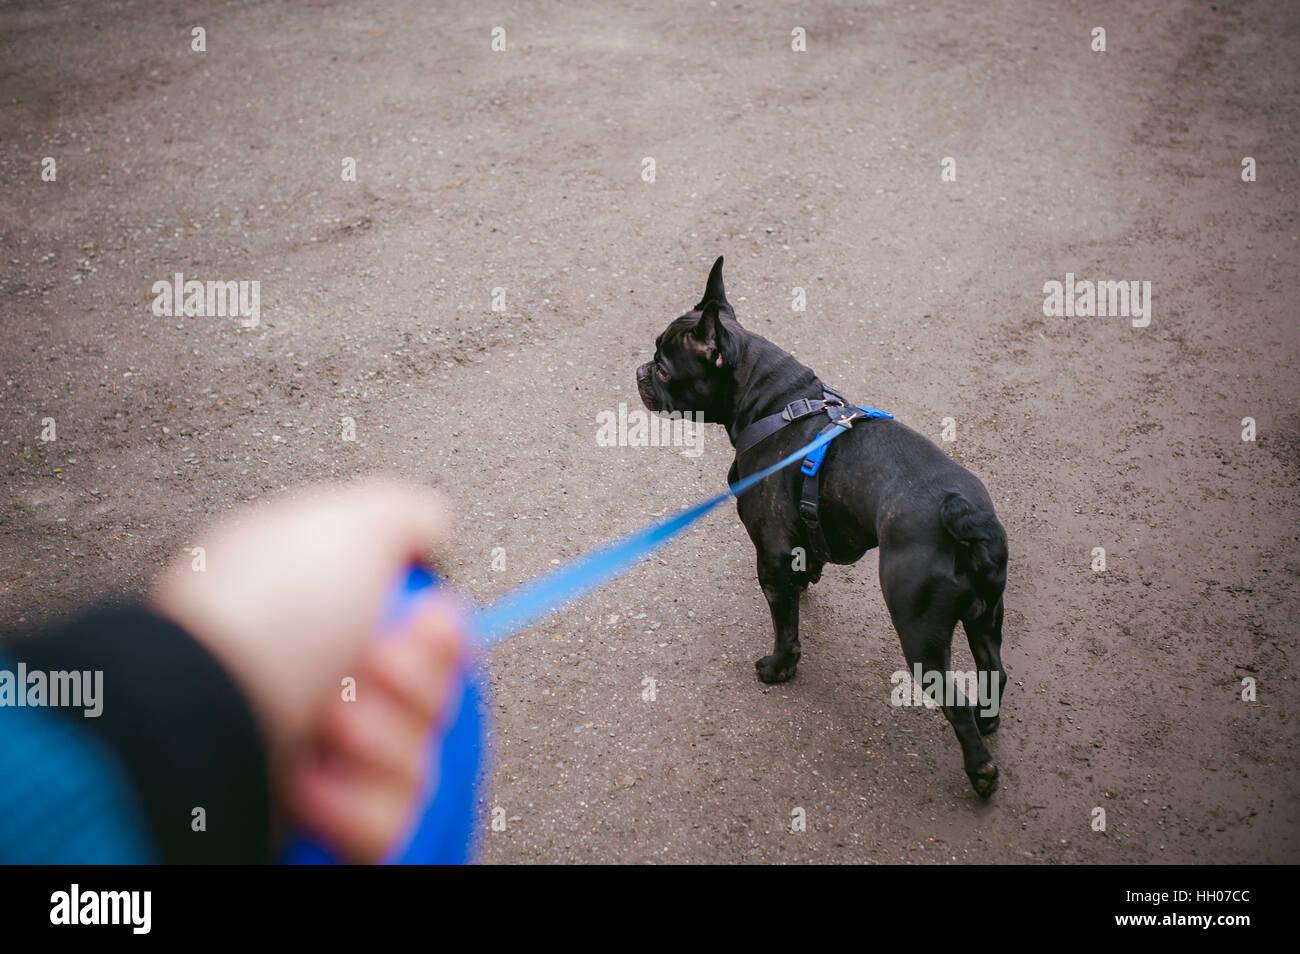 walking the dog French Bulldog - Stock Image